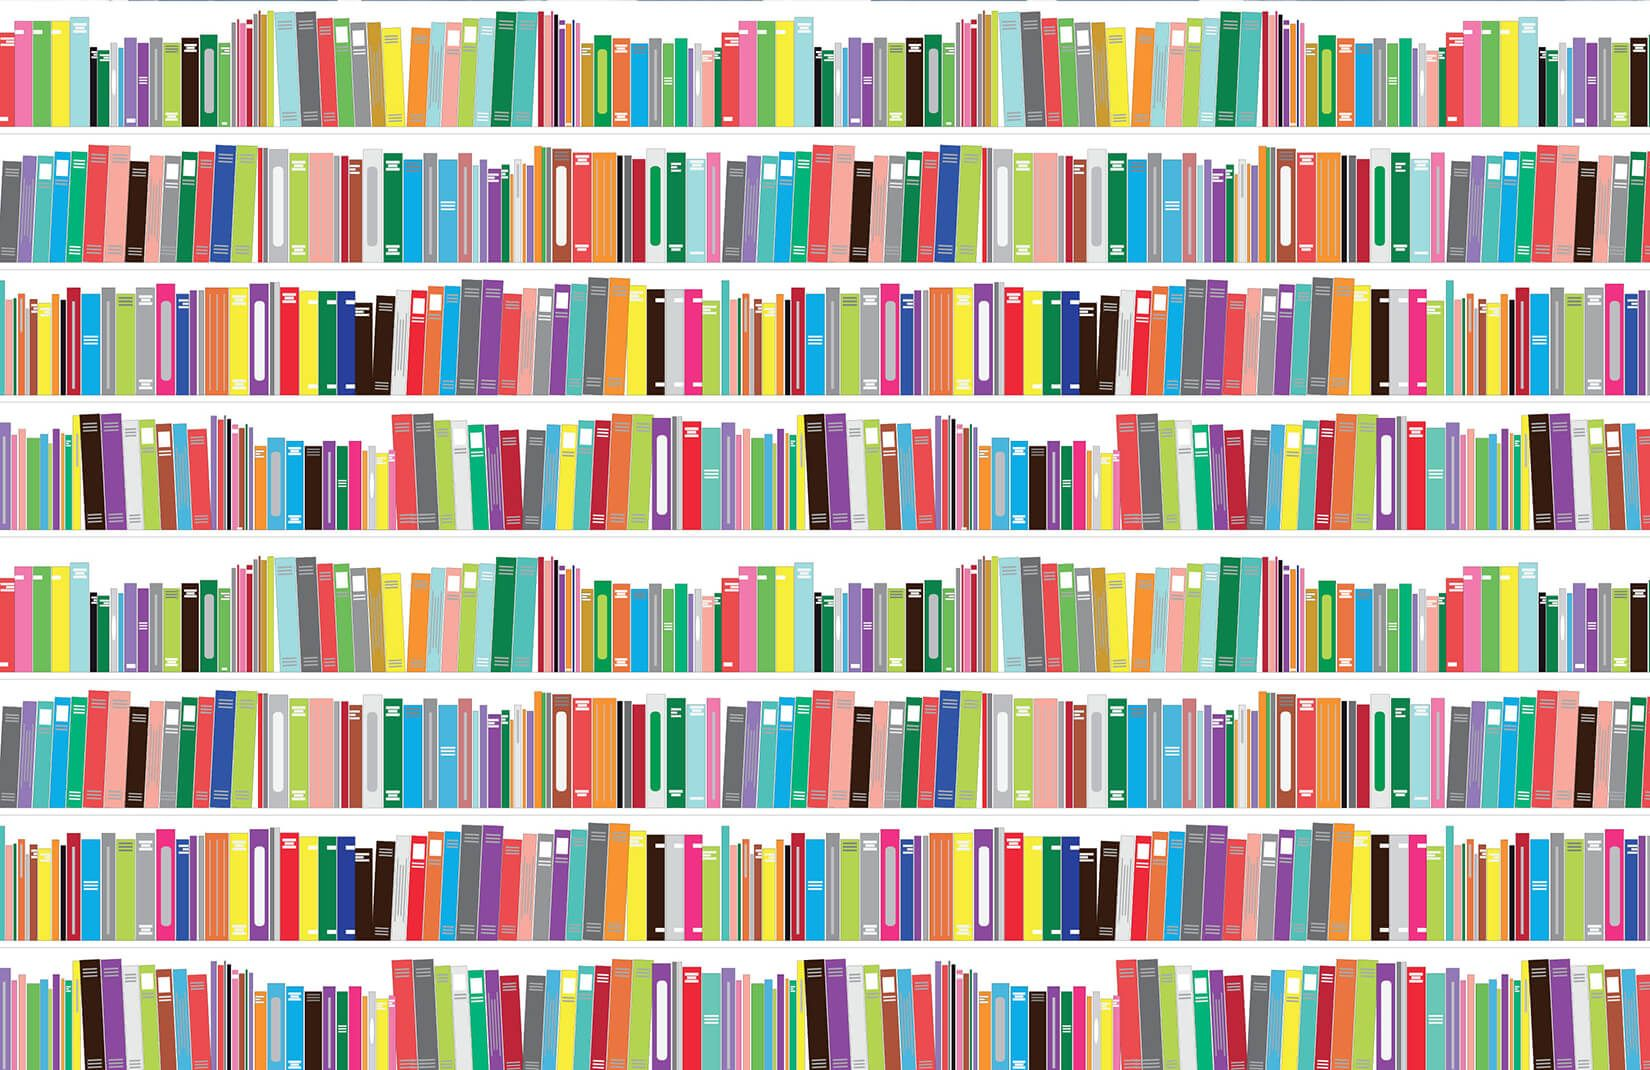 Bright Bookcase Mural in 2019 Bookcase, Feature